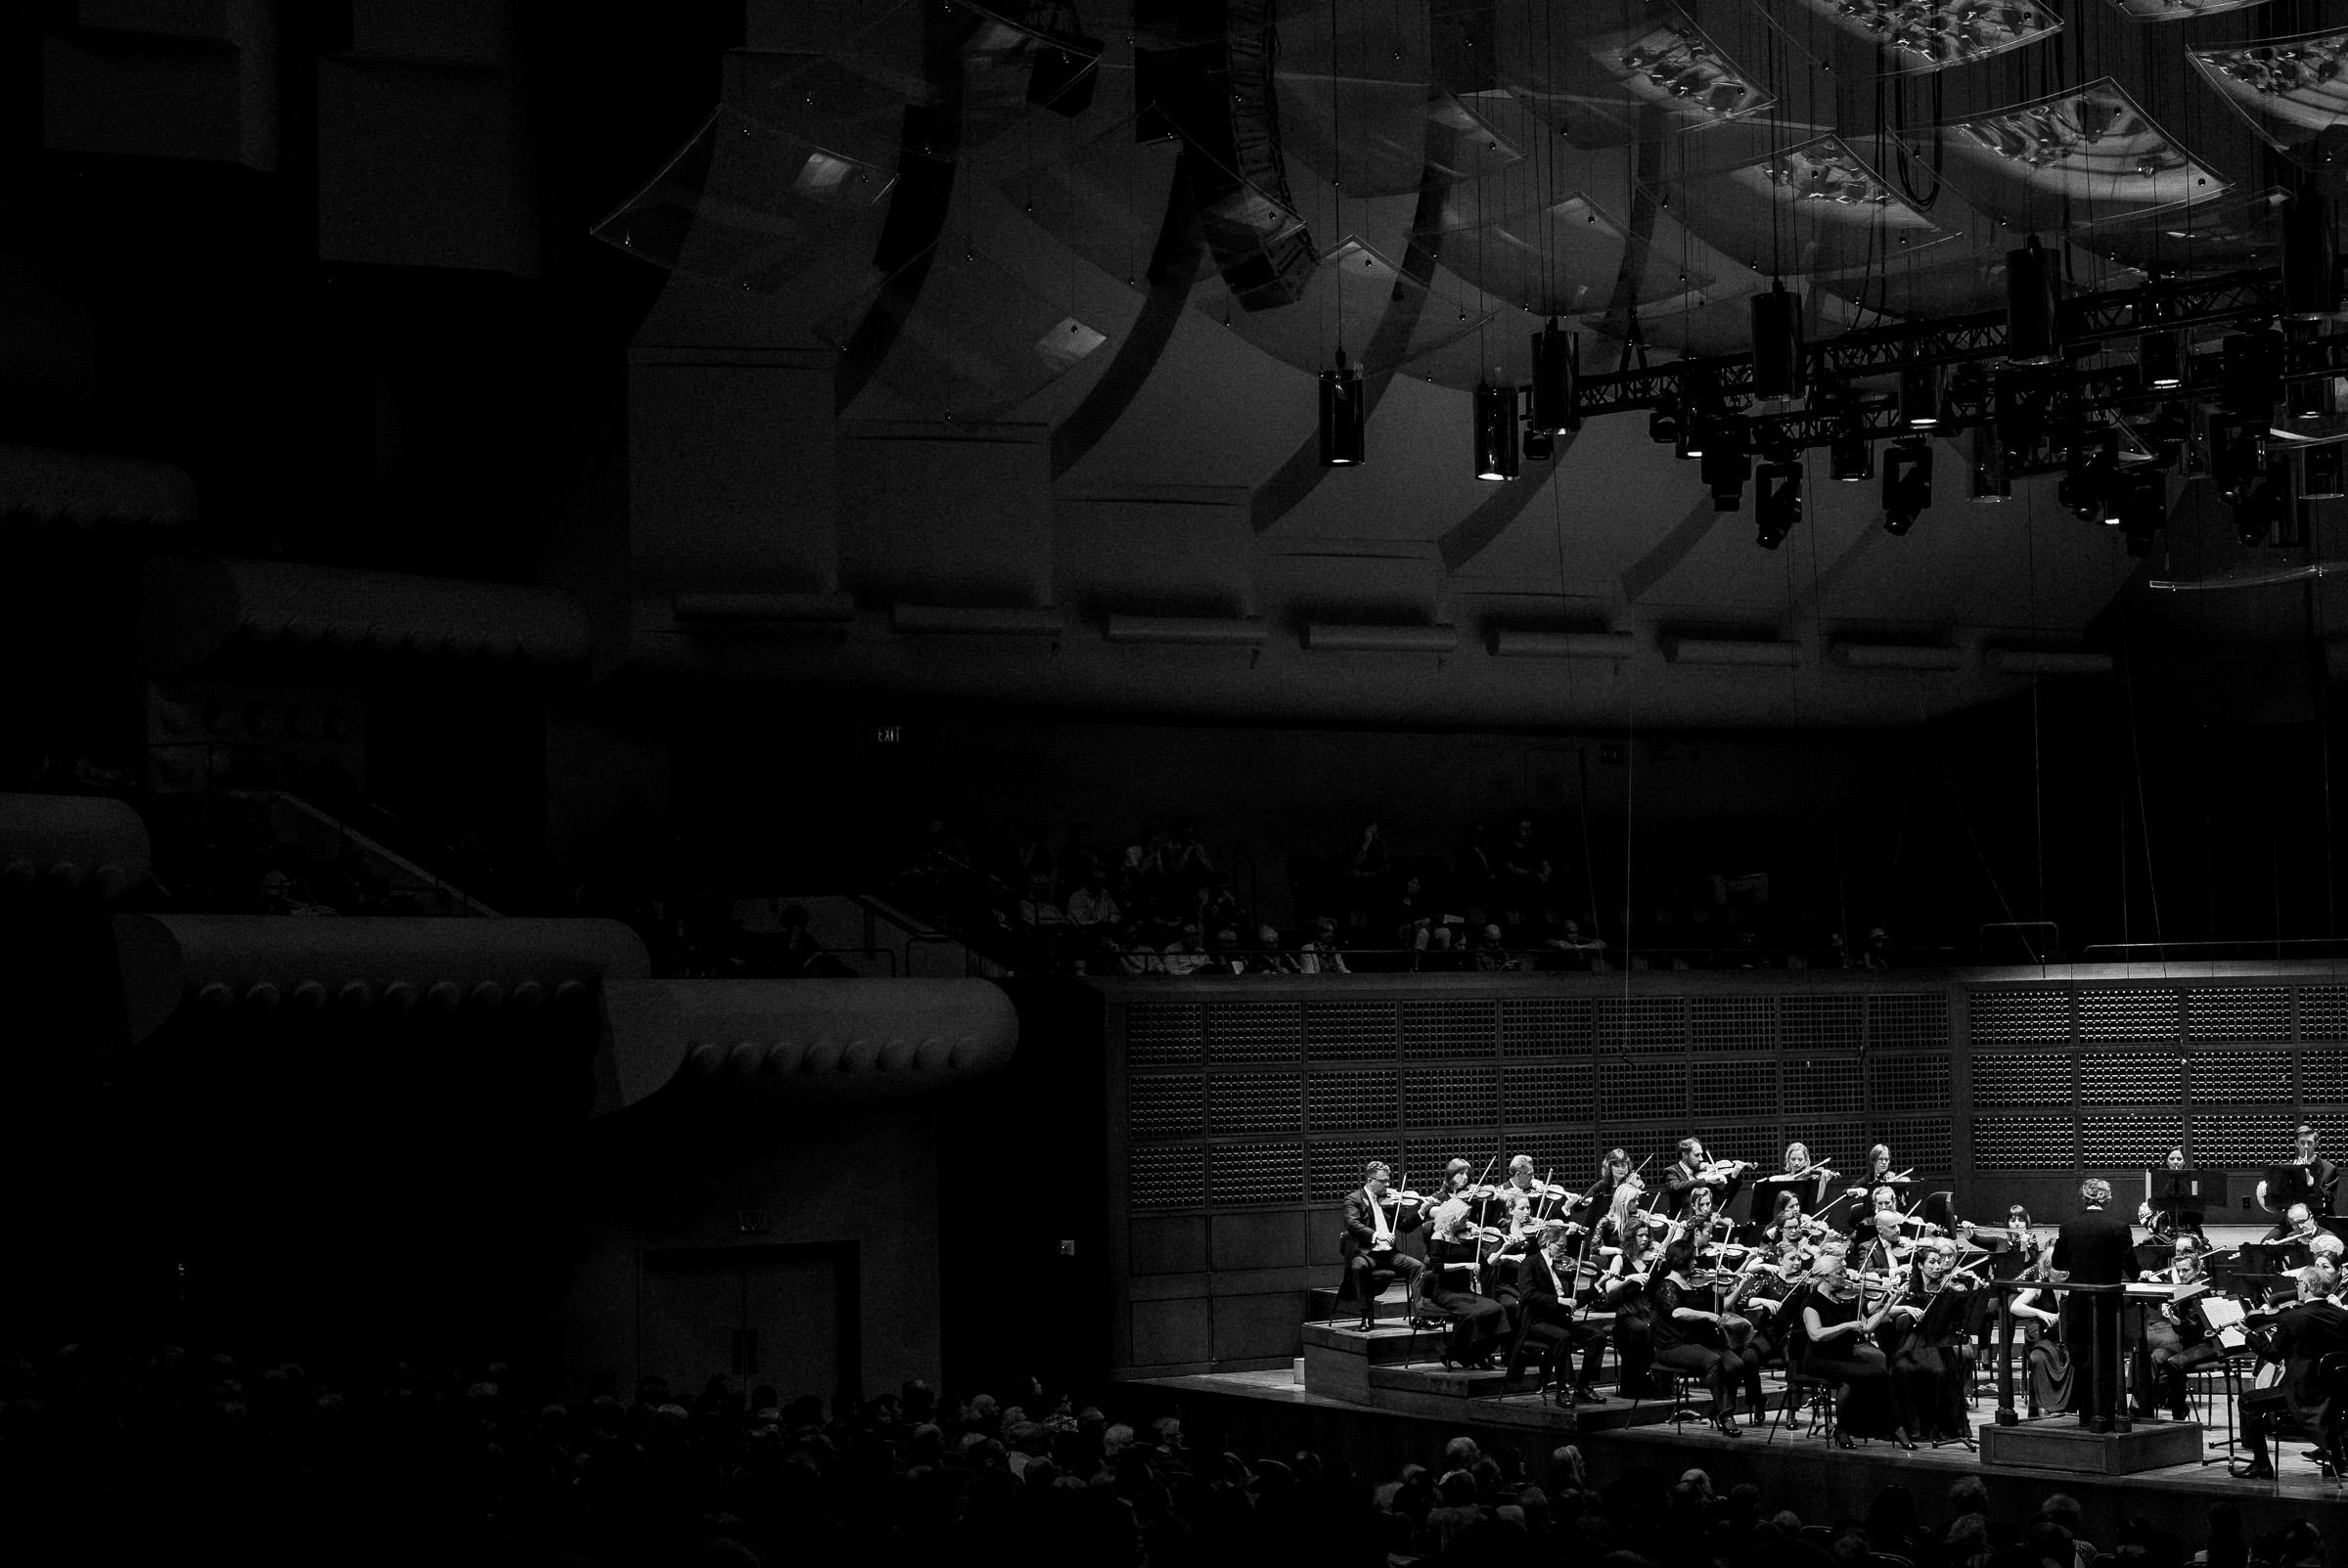 danish_national_symphony_orchestra_davies_hall_brandon_patoc_luisi_0007.jpg